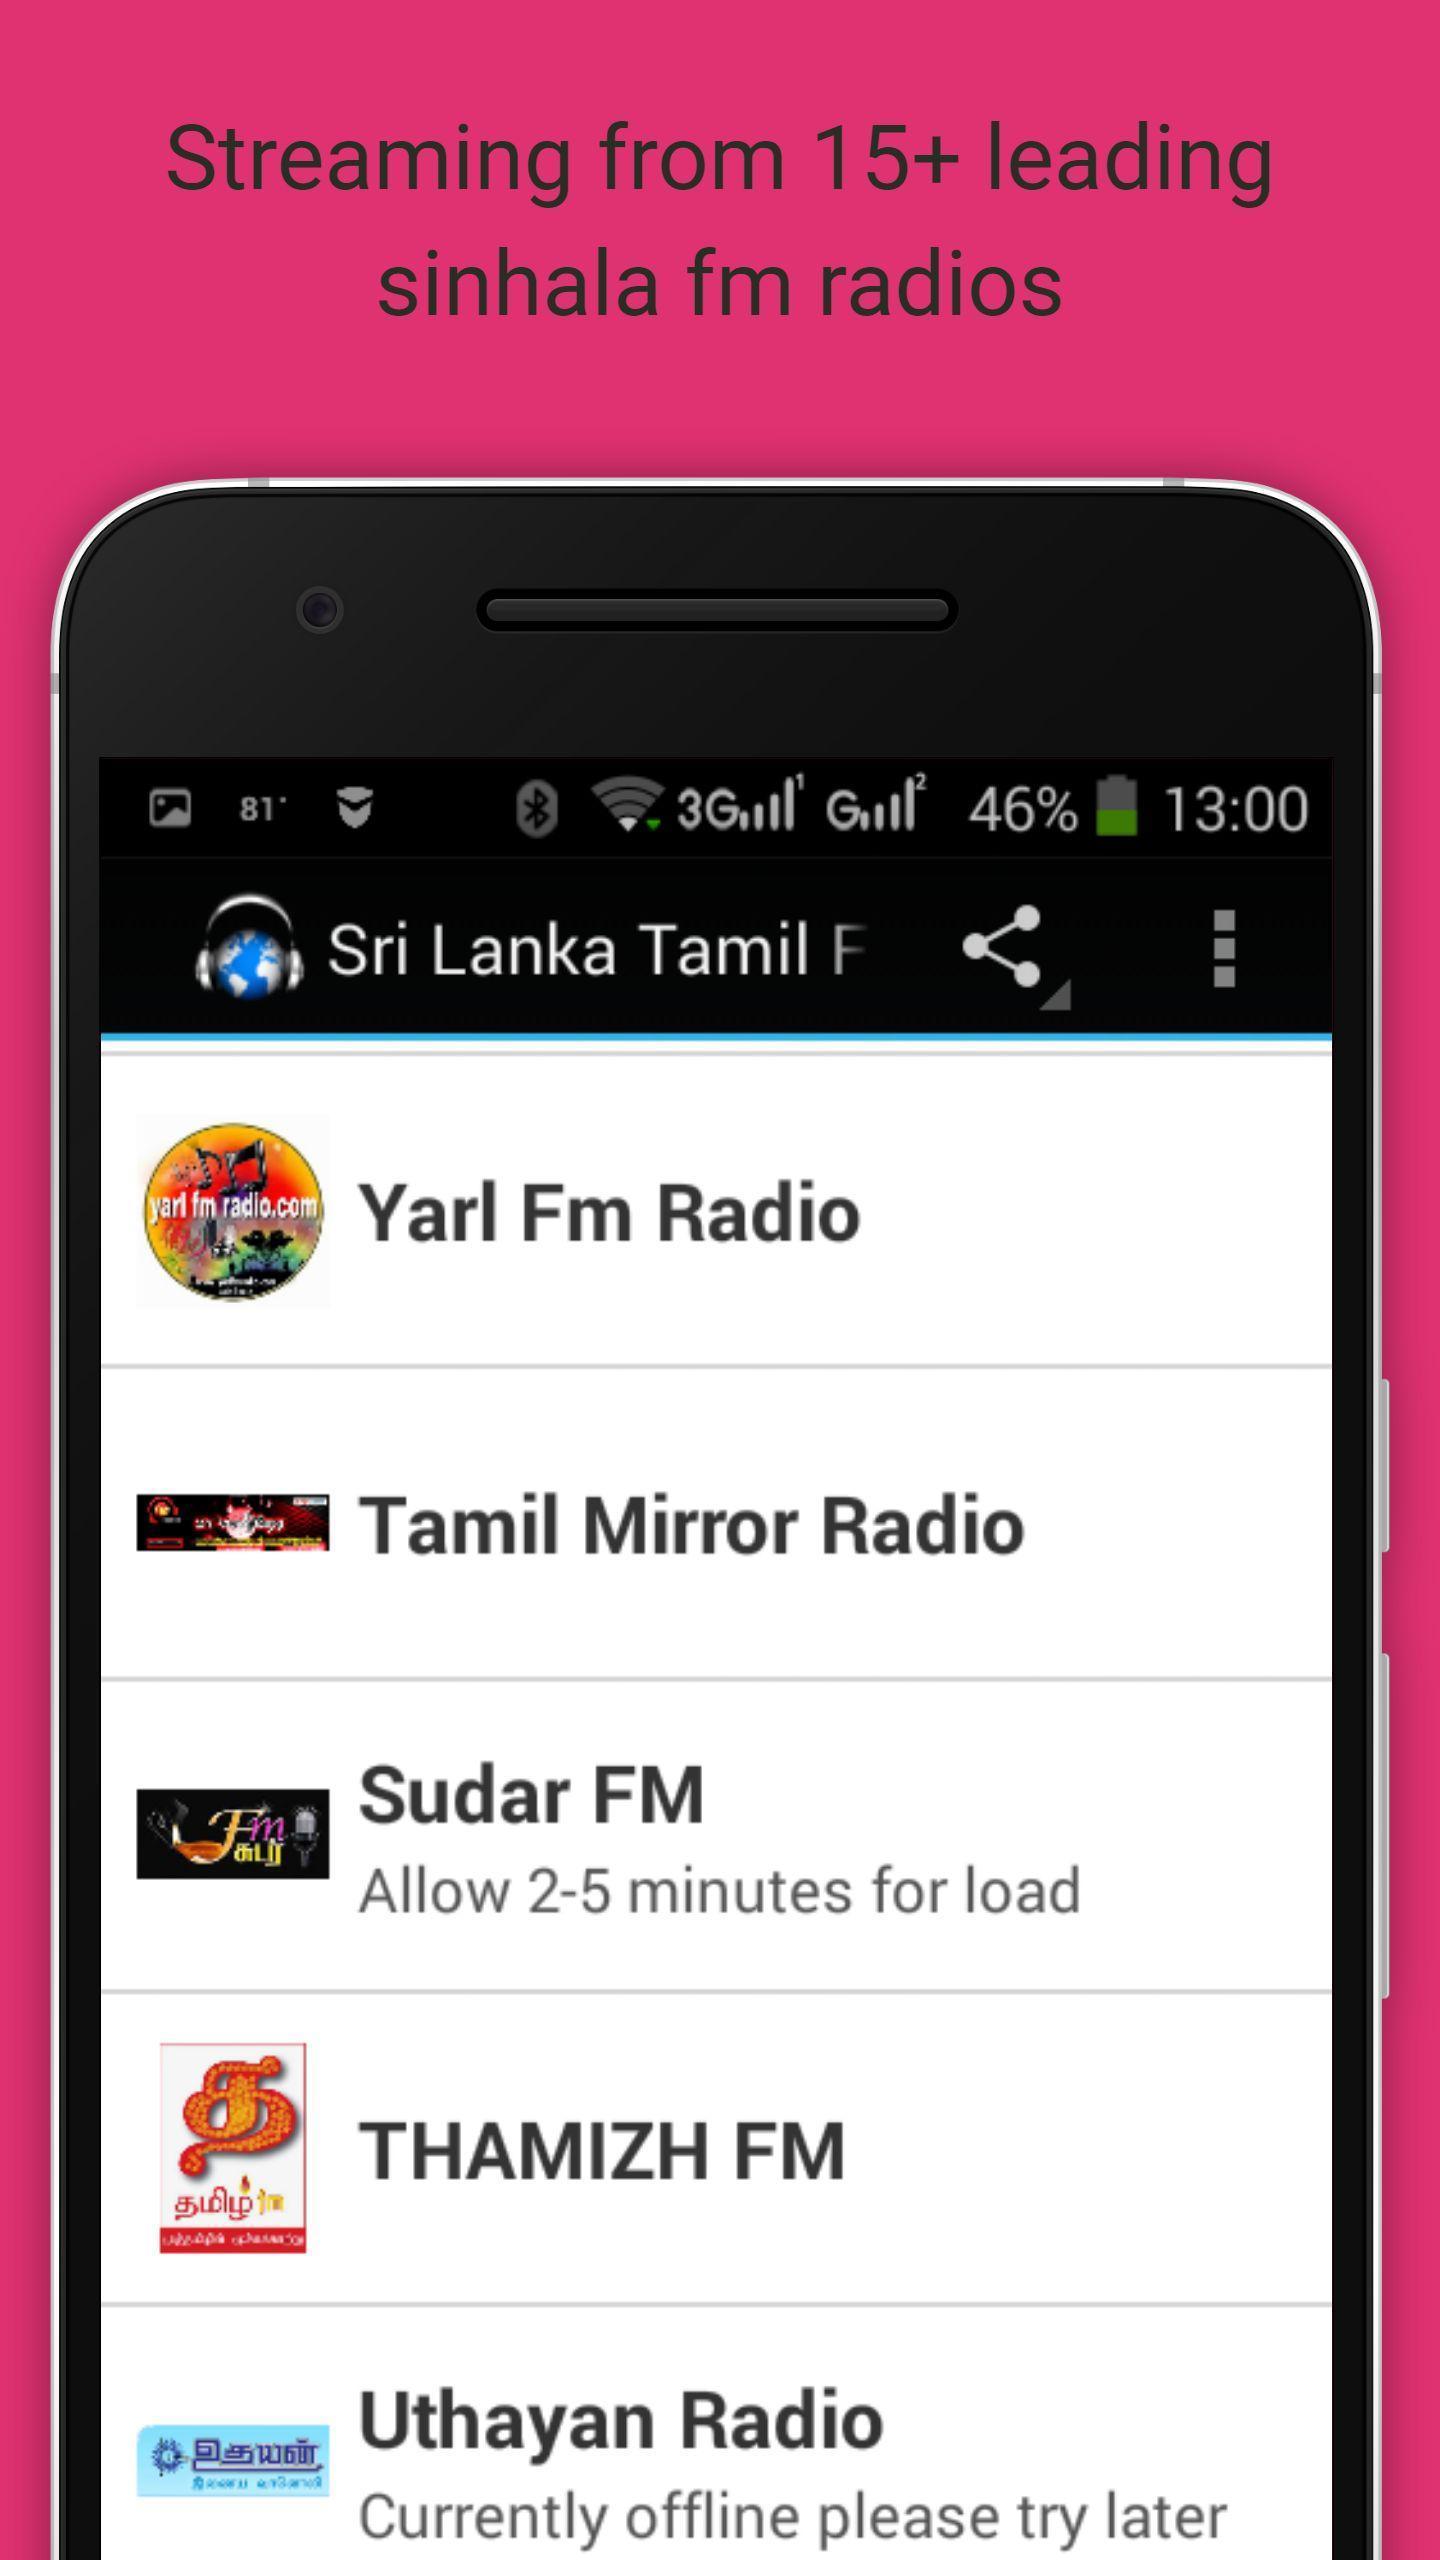 Sri Lanka Tamil FM Radio for Android - APK Download